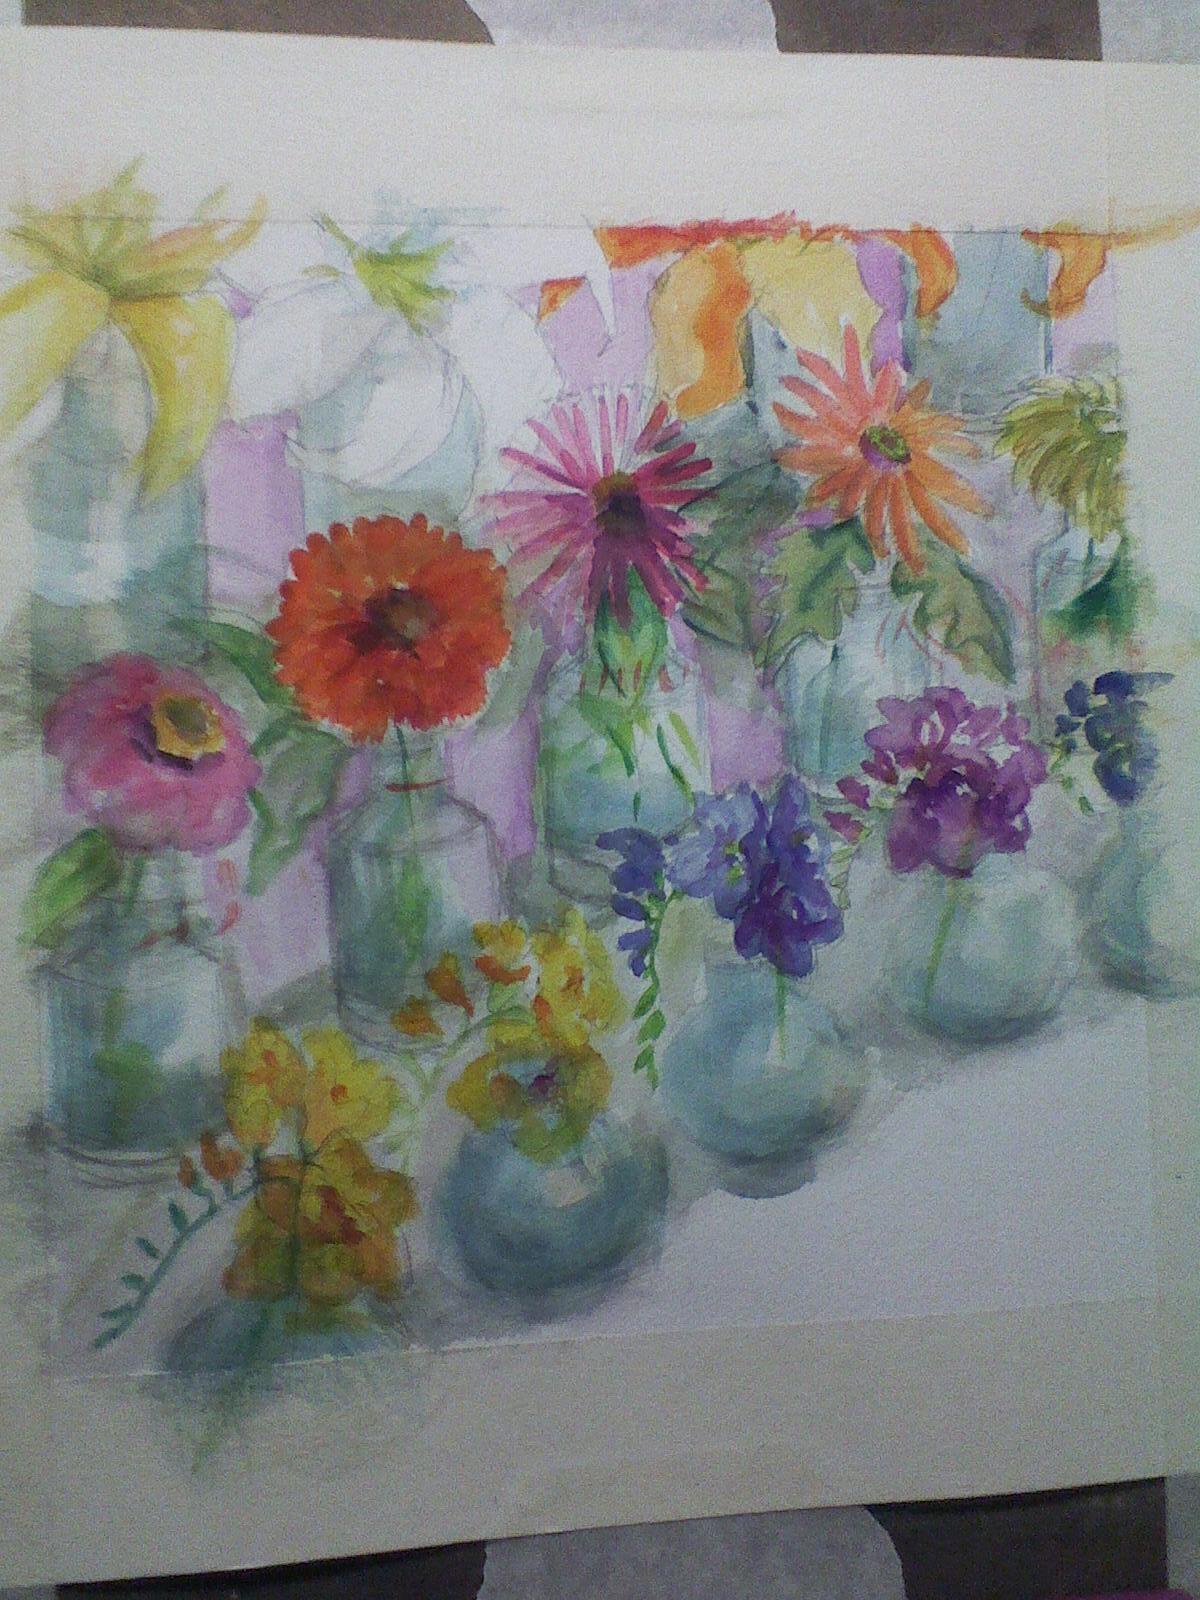 Water-color study of Jill's pencil sketch